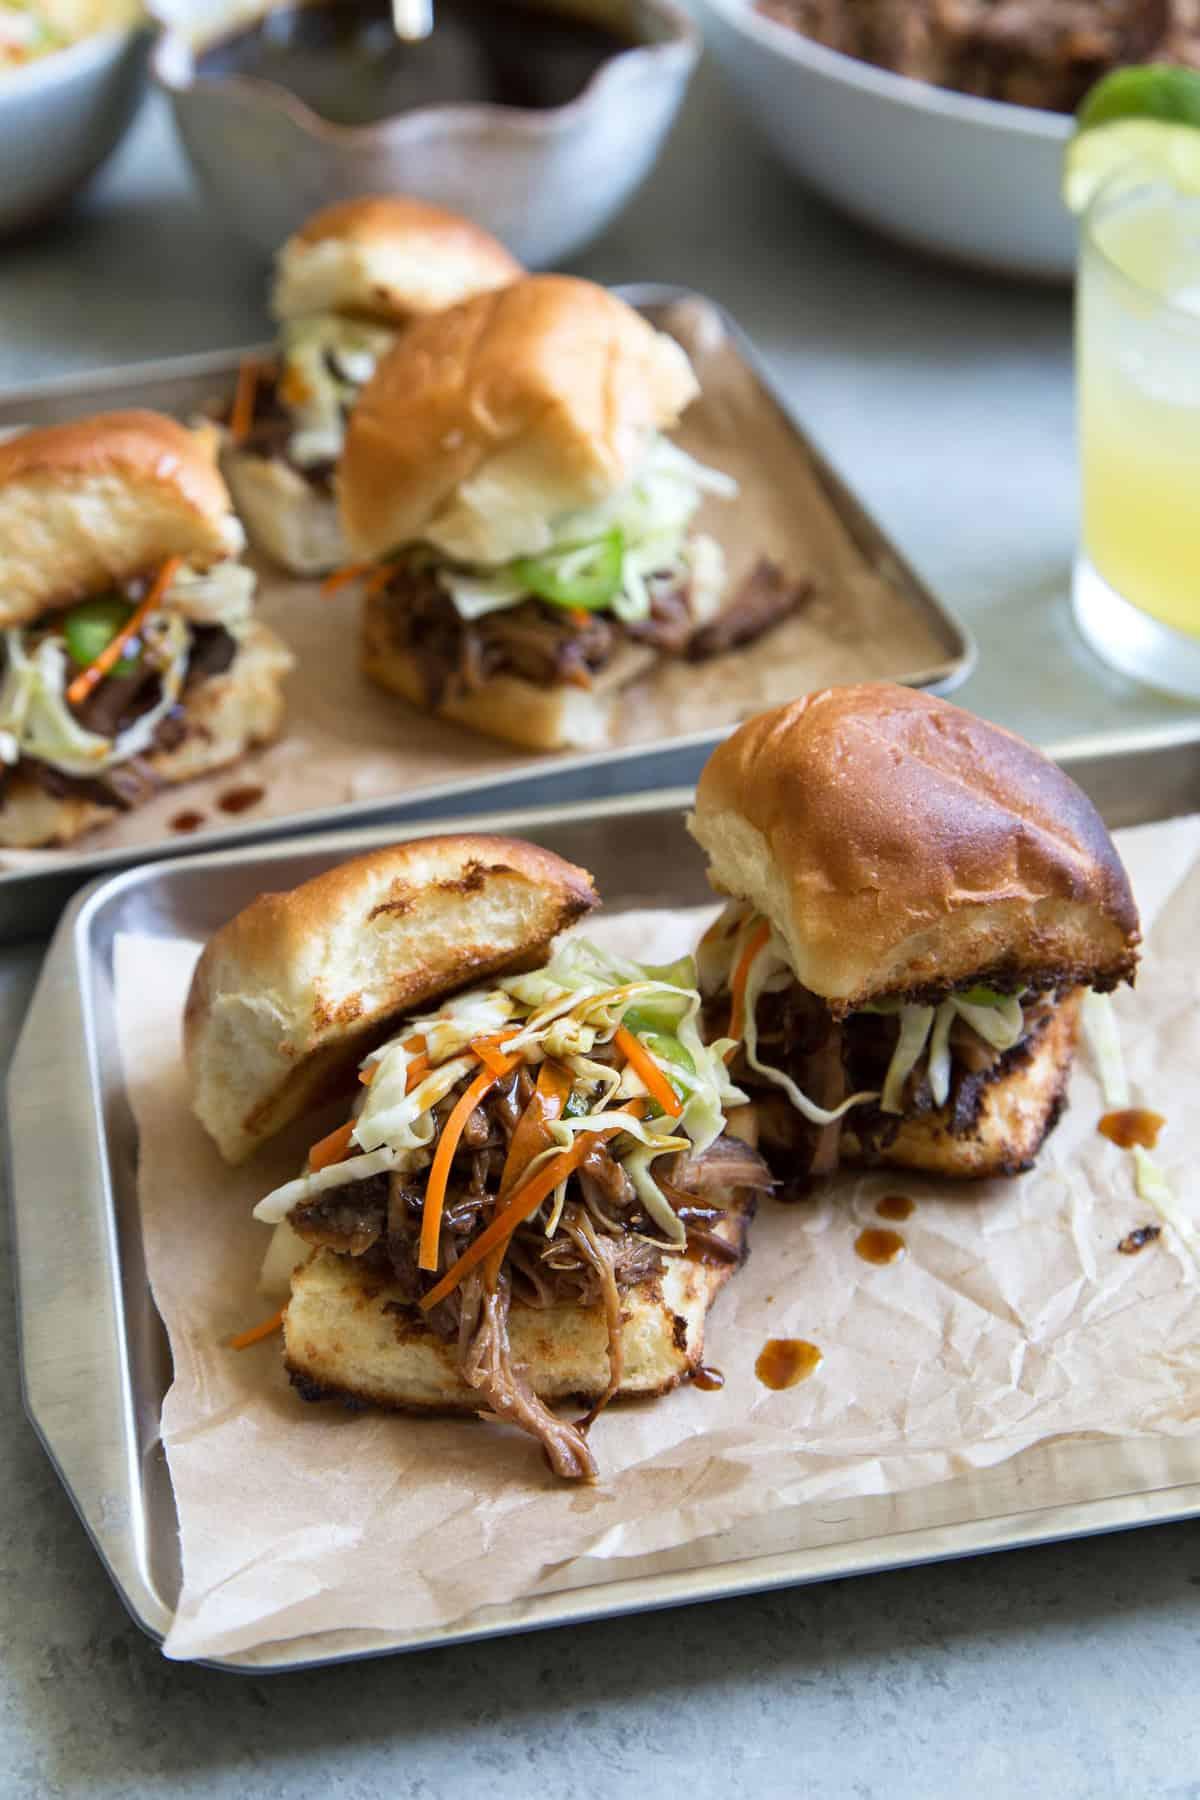 Shoyu Pulled Pork Sliders with Pineapple Slaw